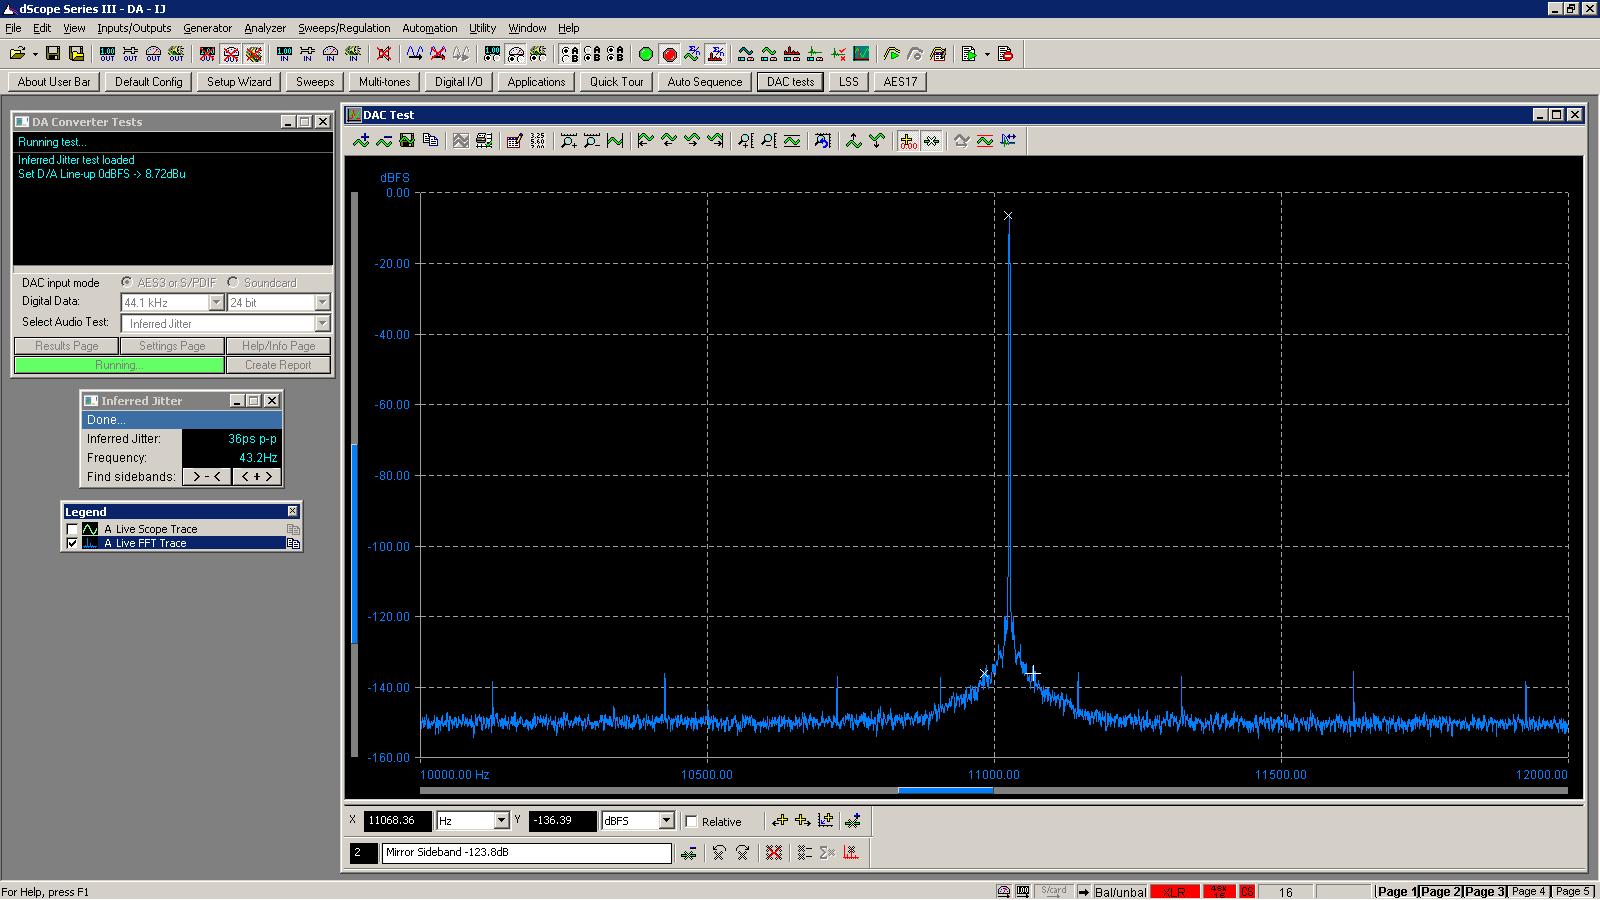 20151120 Bifrost MB SE inferred jitter - 2KHz BW - toslink.PNG